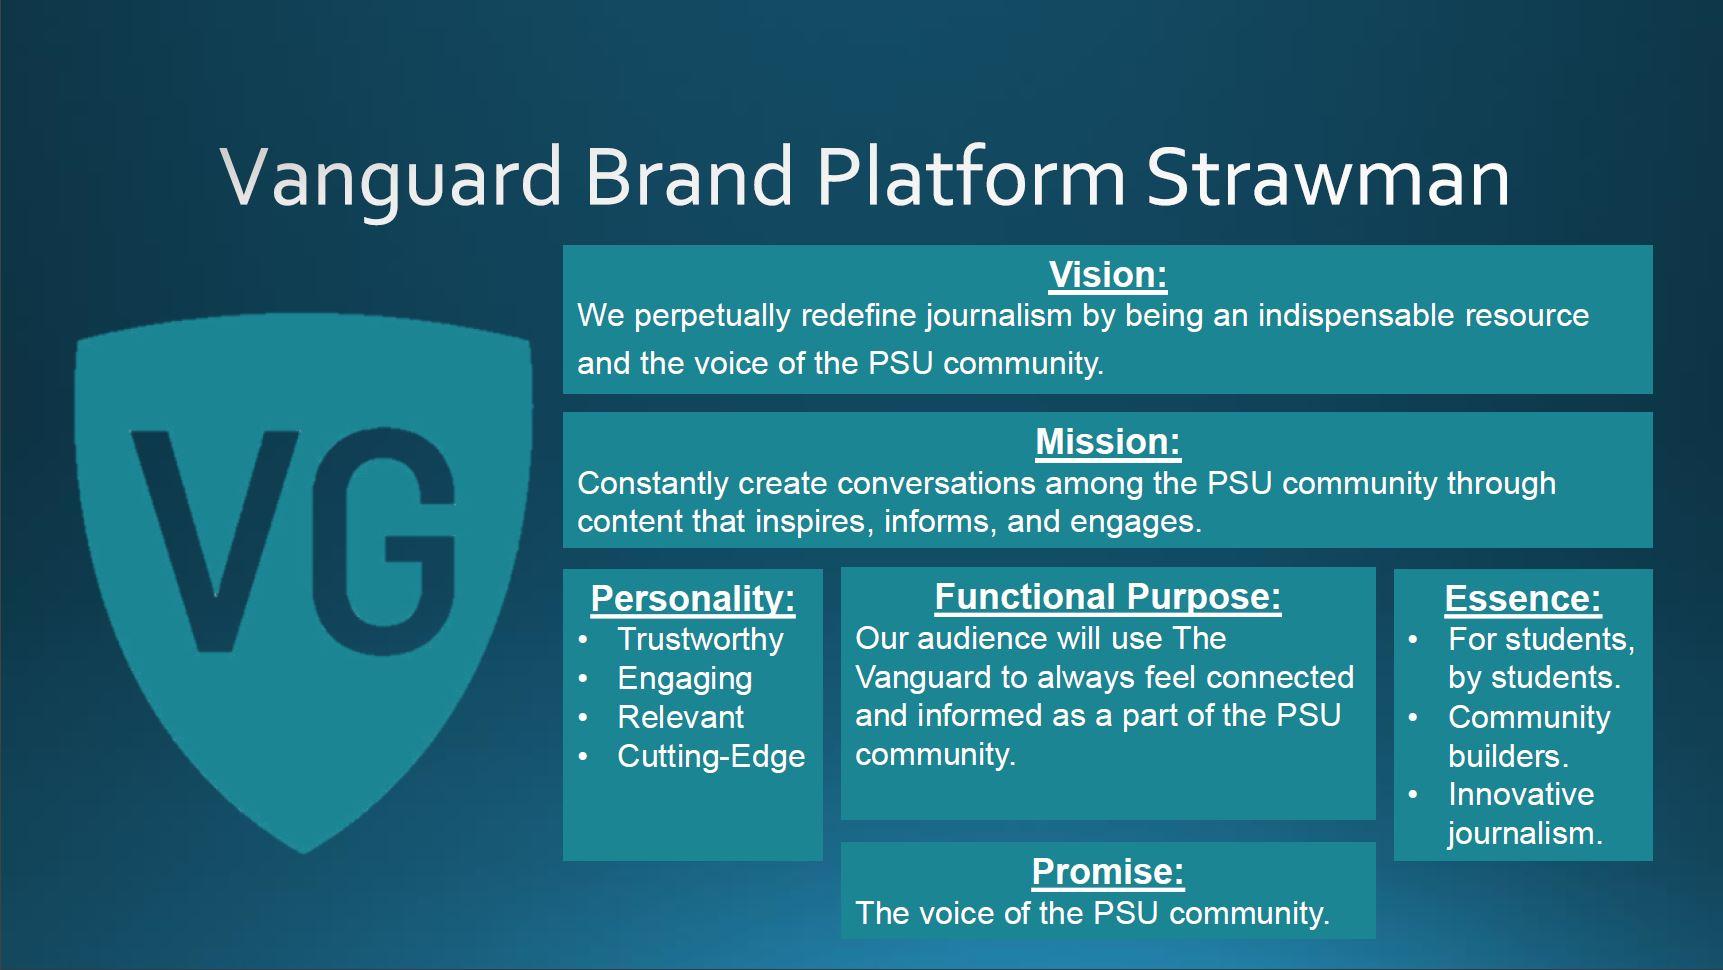 vanguard brand platform.JPG